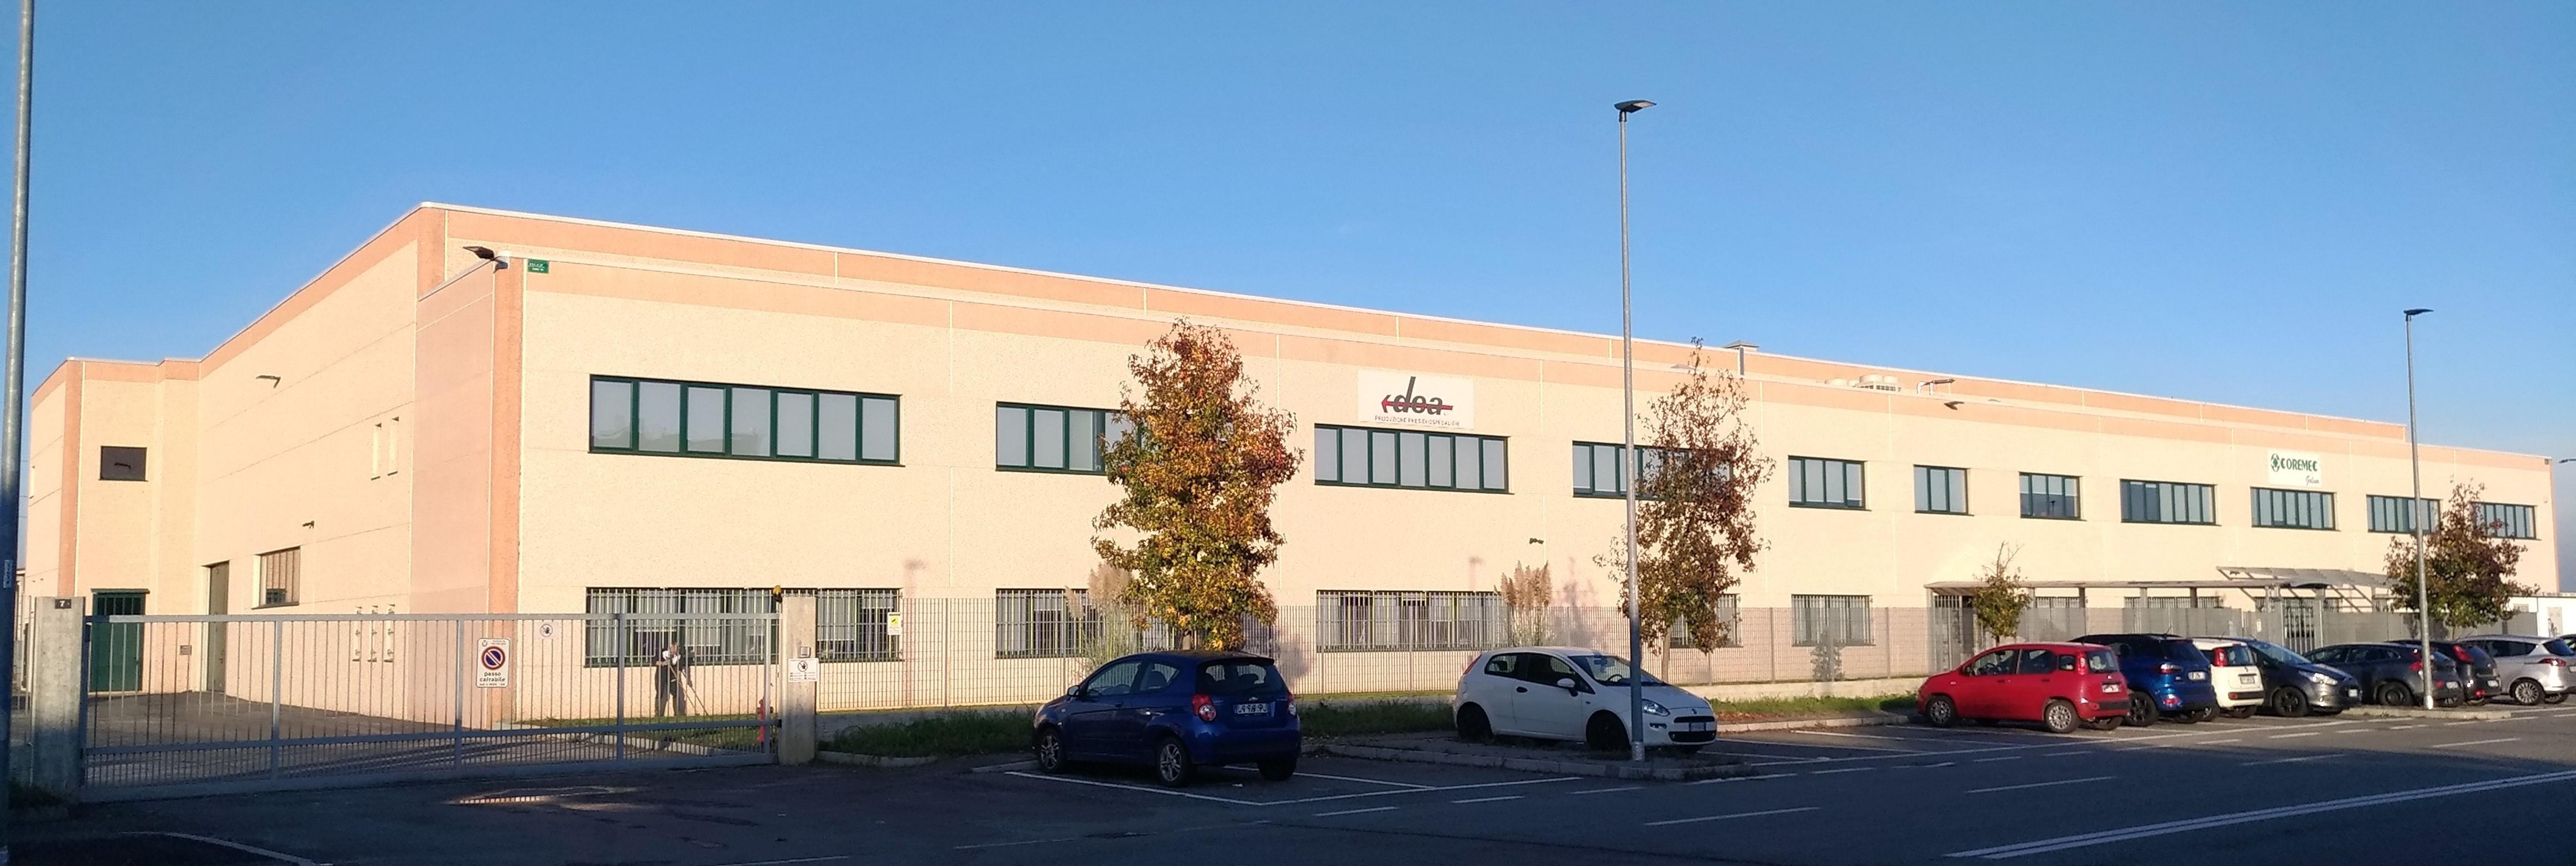 DEA Building